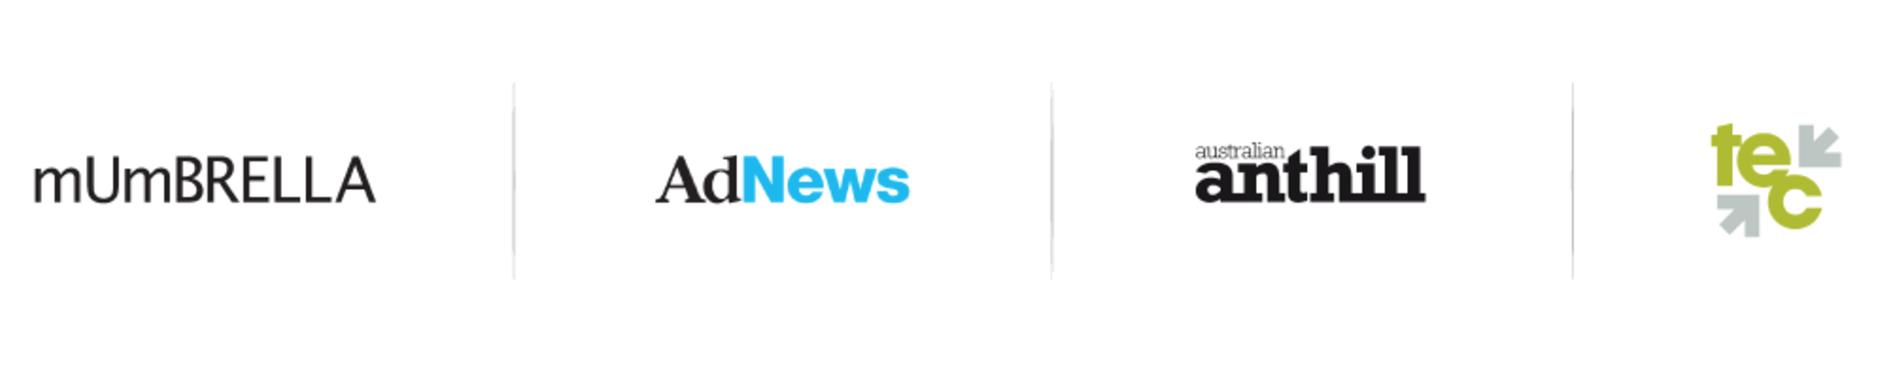 Ad_News.png